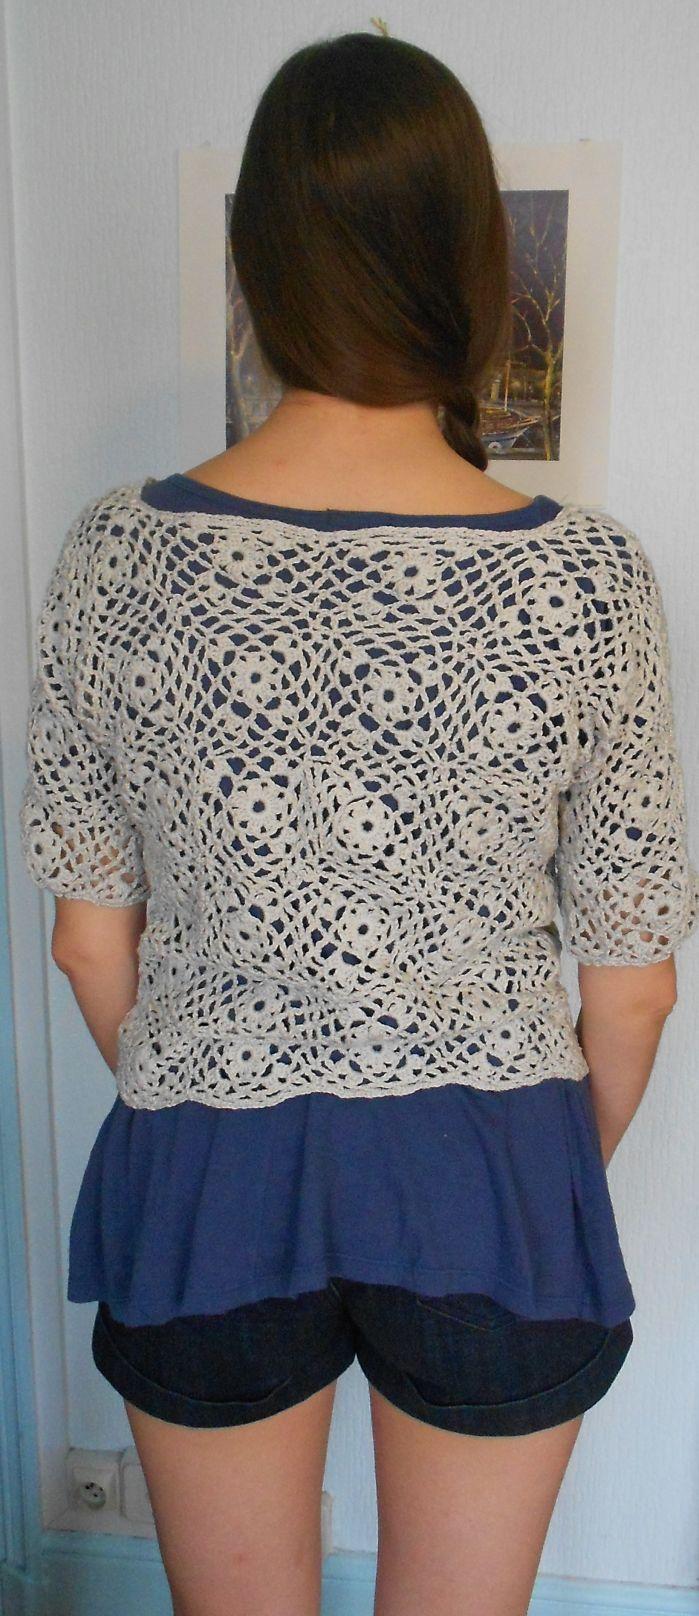 Crochet X Stitch Shrug : Shrug bolero calado Crochet Pinterest